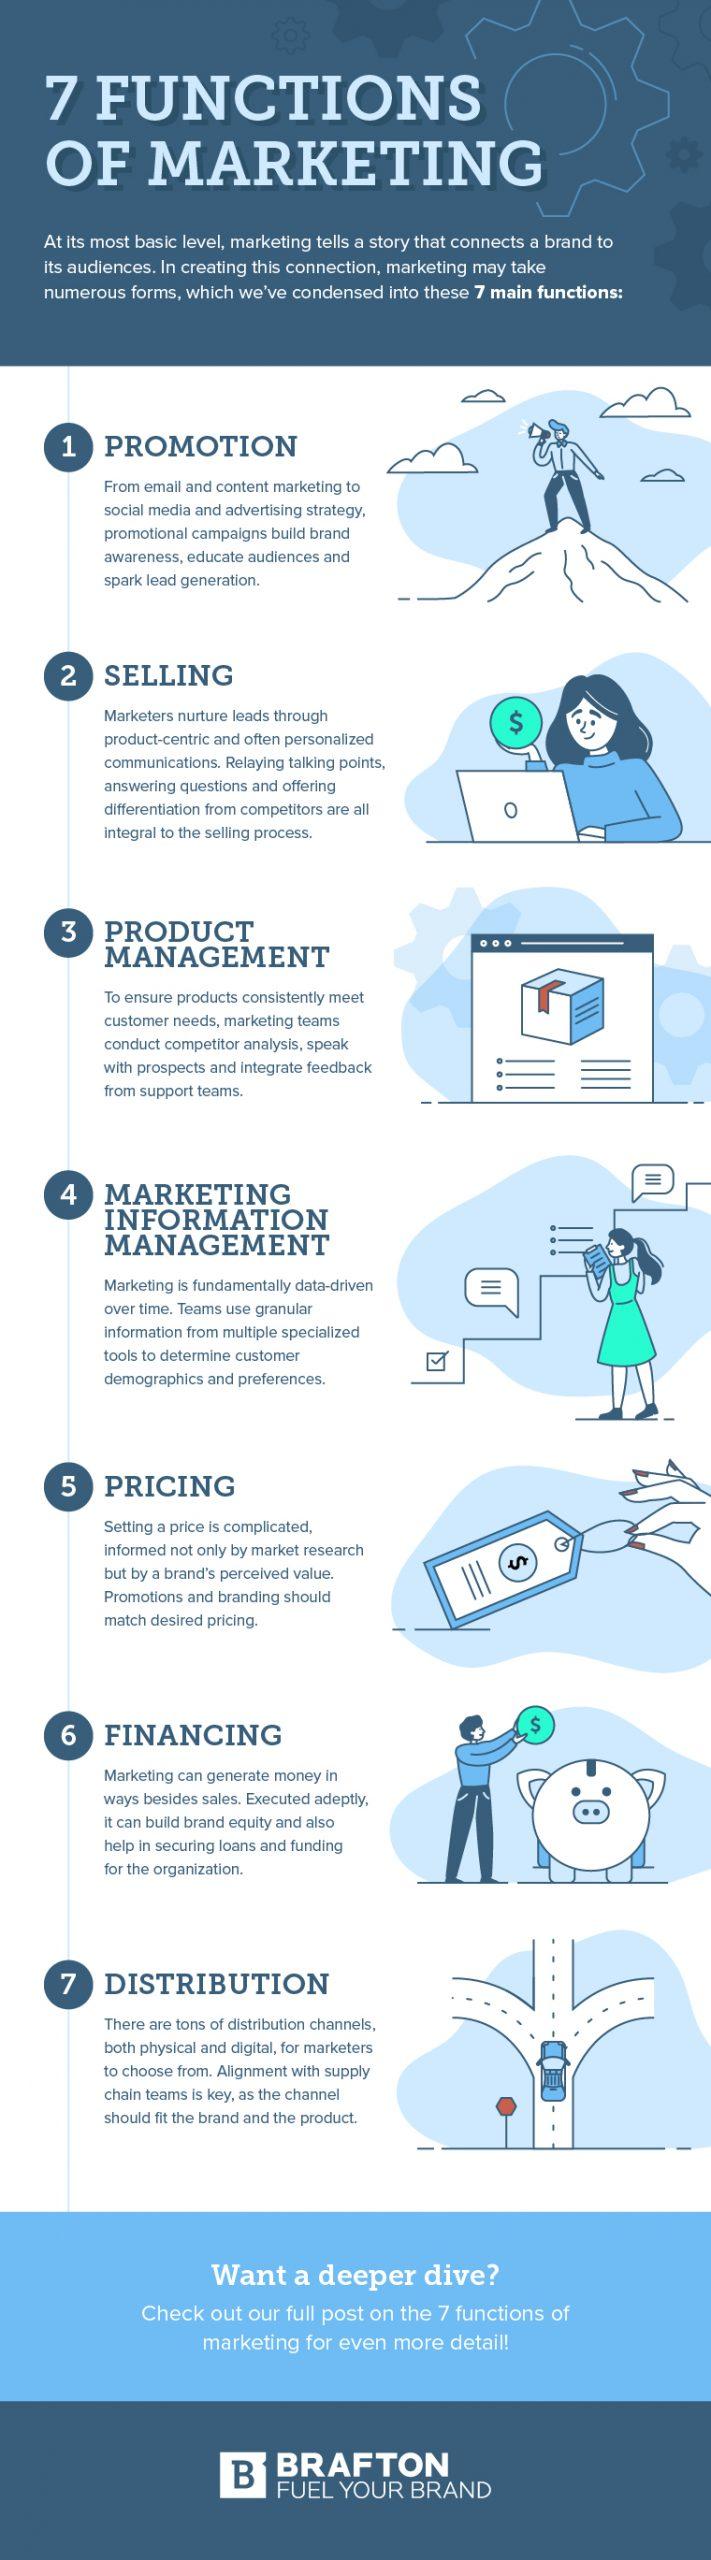 Understanding The Advertising Response Function Helps Marketers : understanding, advertising, response, function, helps, marketers, Functions, Marketing:, Field, Guide, (Infographic), Brafton